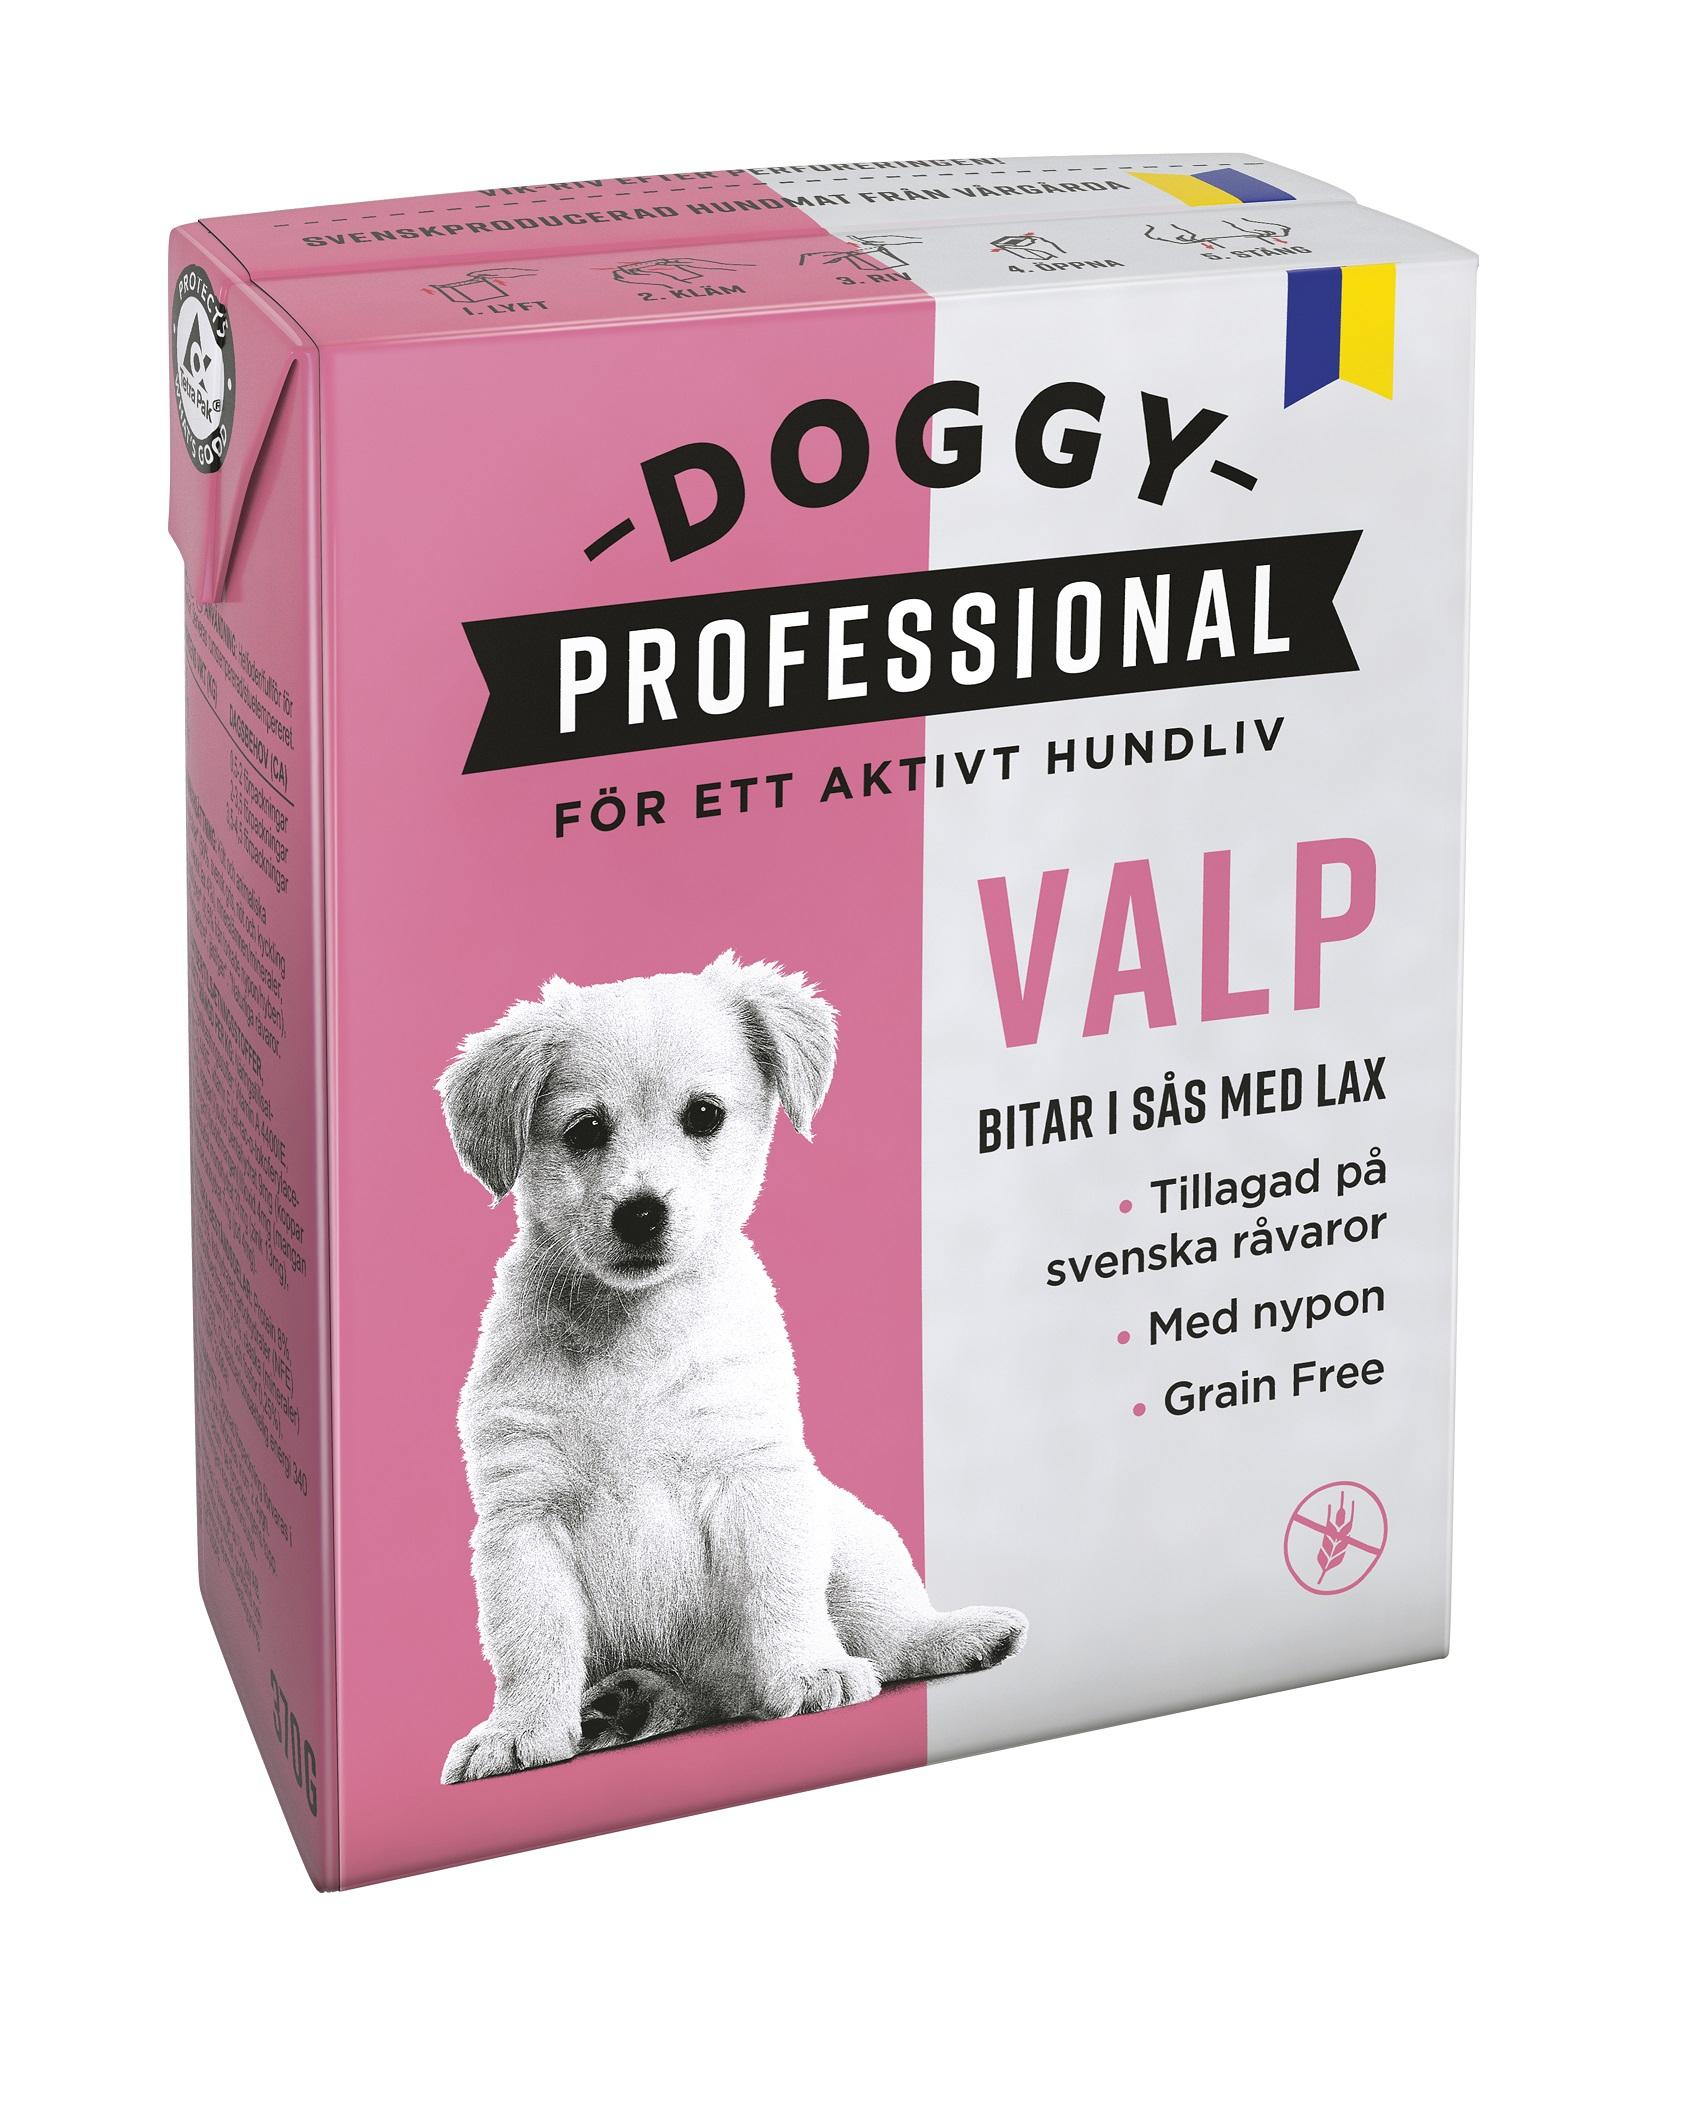 Doggy Våtfoder Valp m lax och nypon 370g